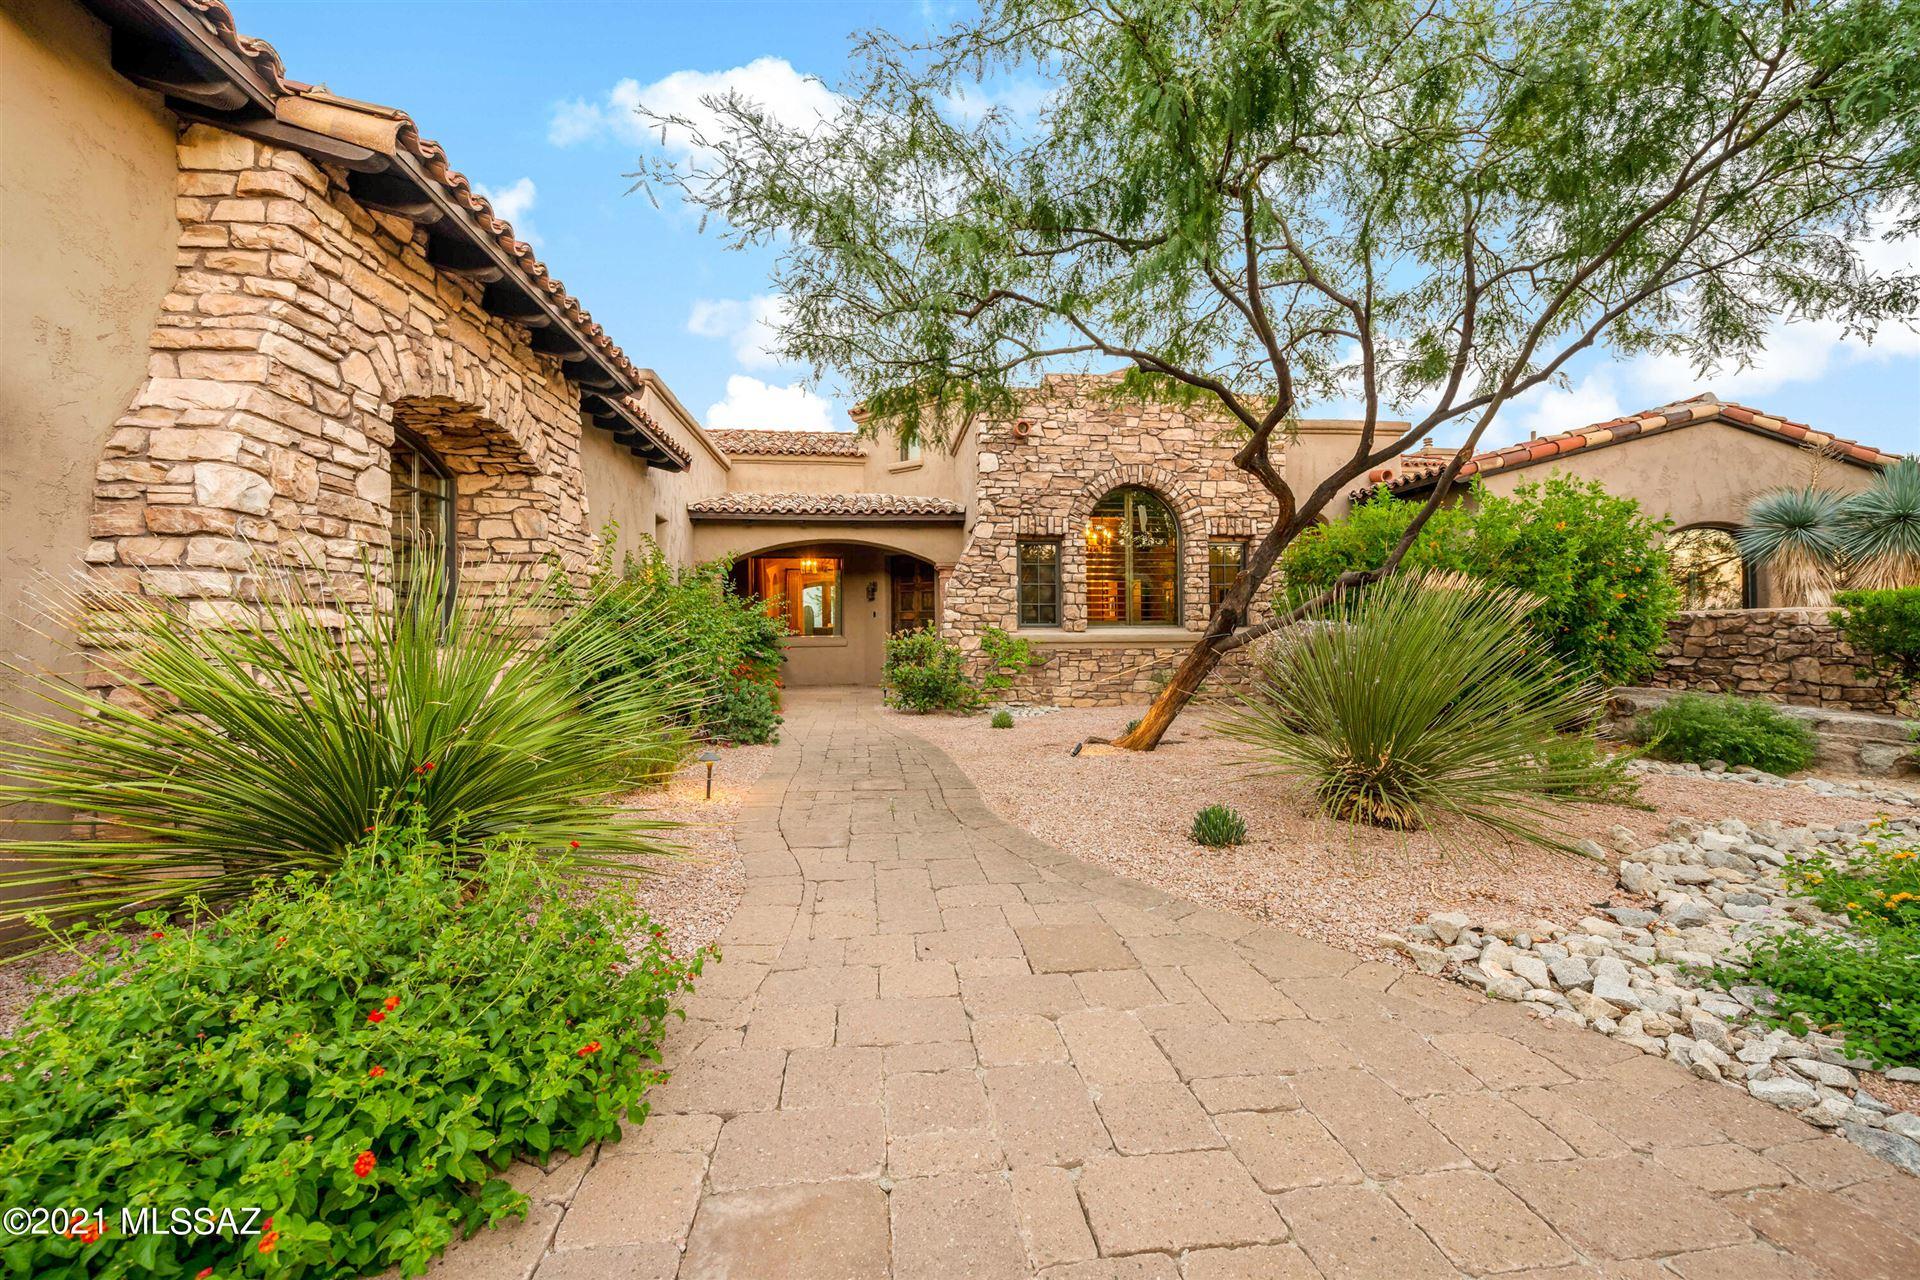 14546 N Shaded Stone Place, Oro Valley, AZ 85755 - MLS#: 22120559